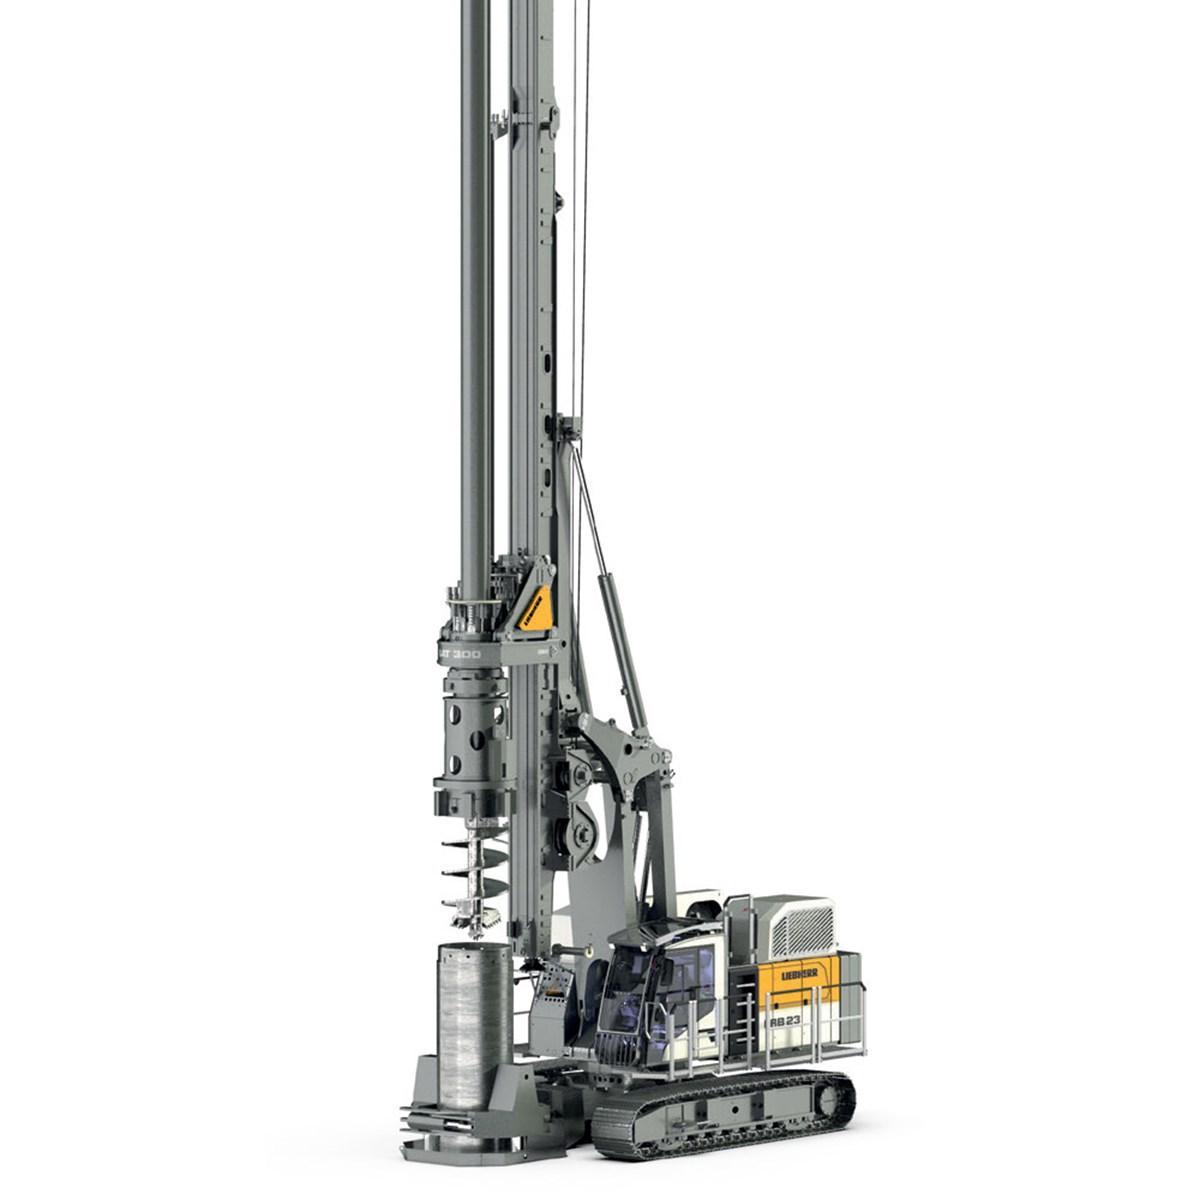 liebherr-lrb-23-piling-and-drilling-rig-ramm-und-bohrgeraet-kelly-drilling-v-1.jpg